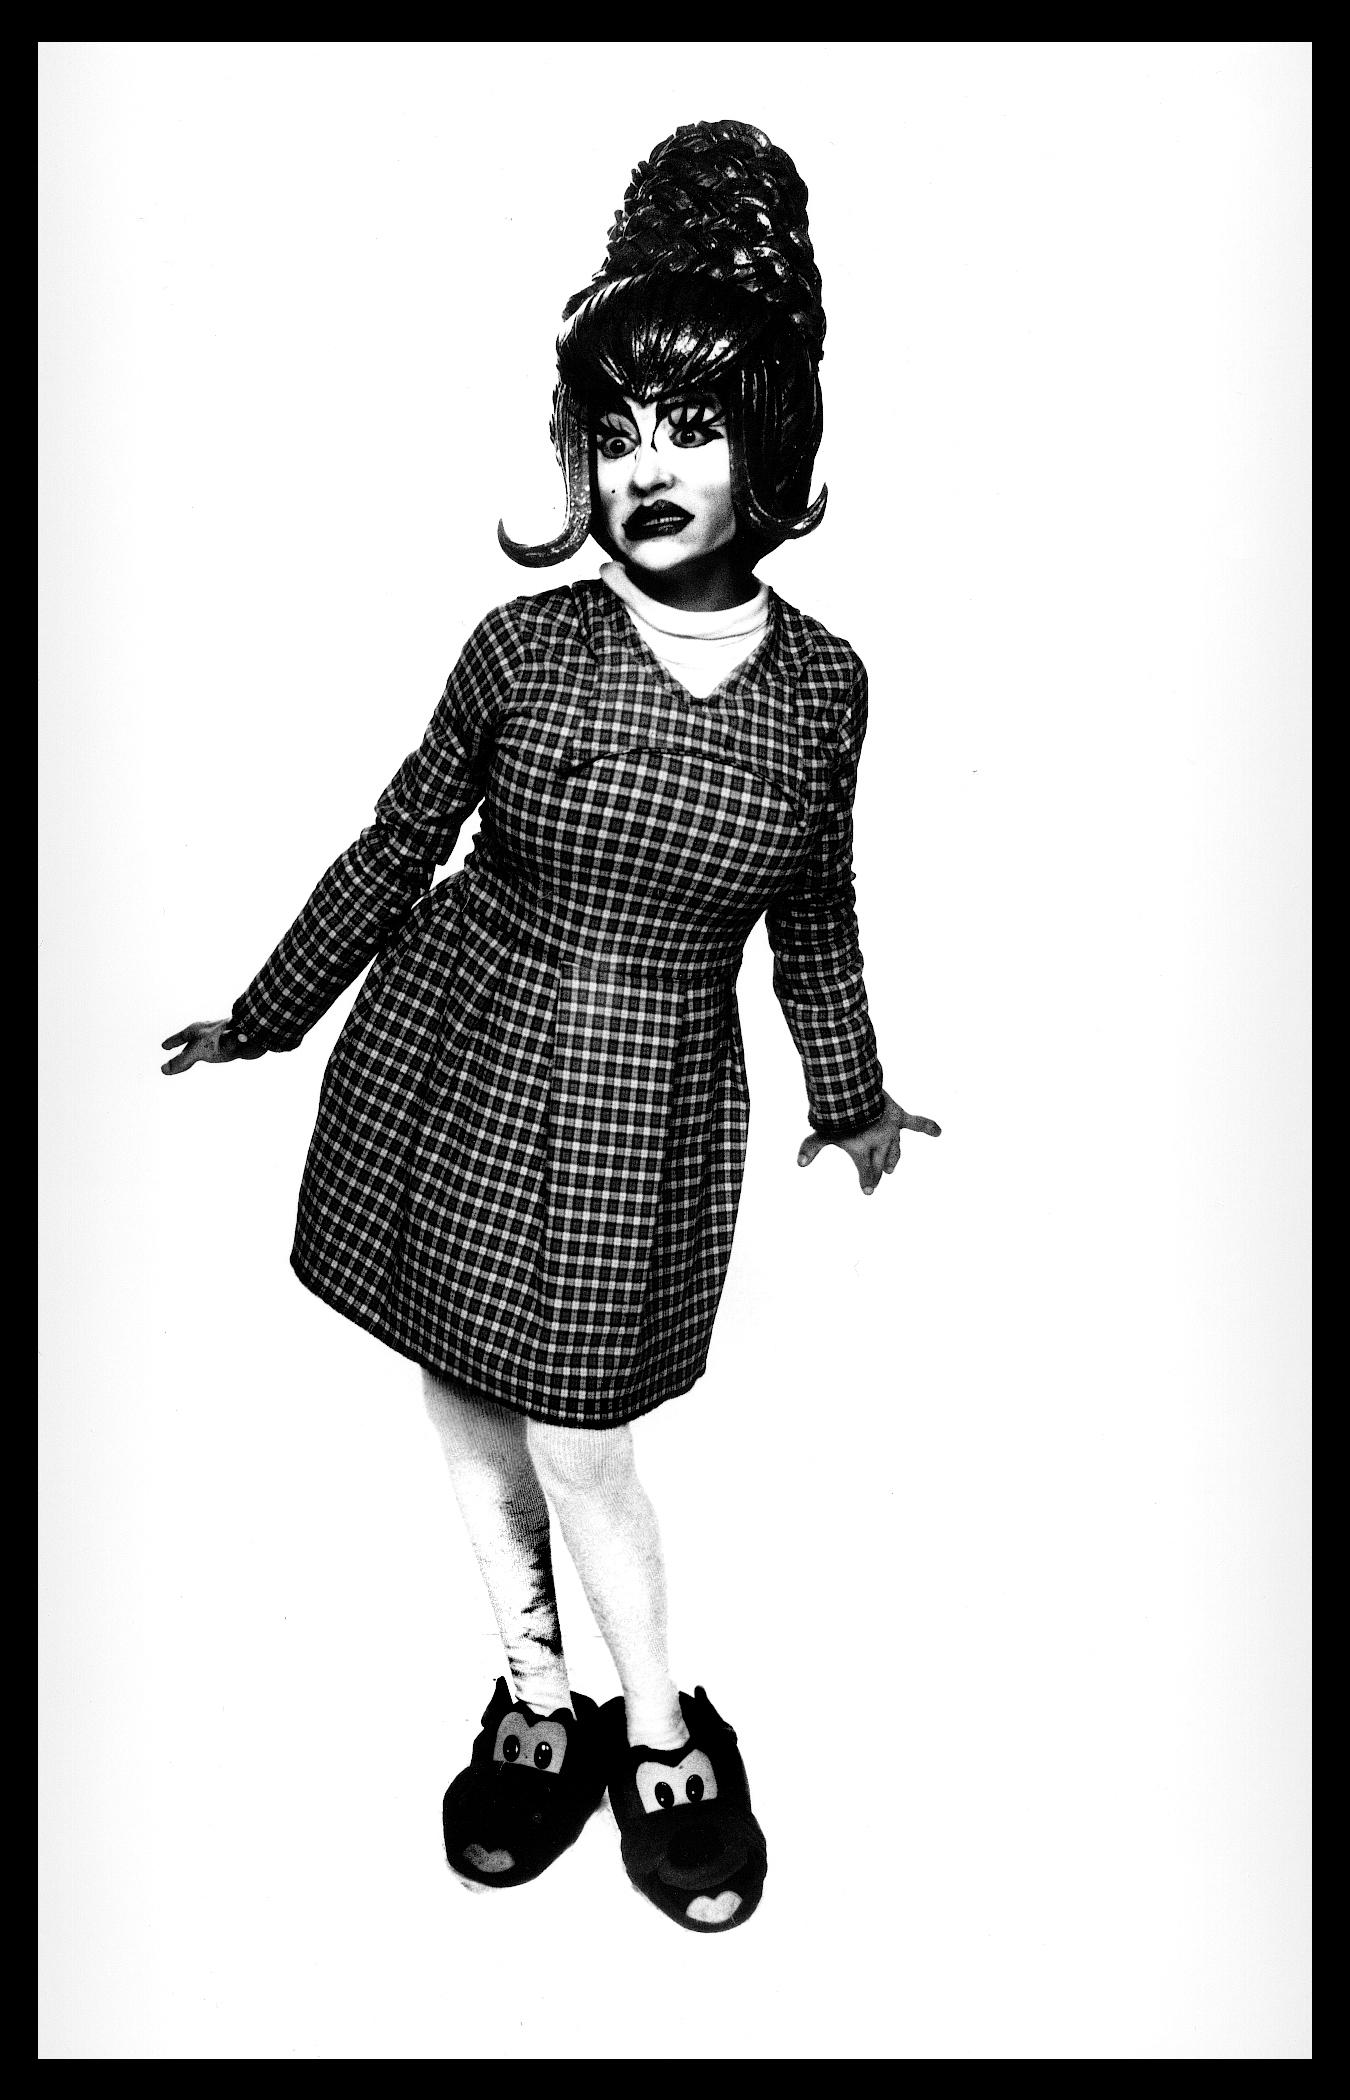 Tony_Ward_wasteland_party_costume_character_Fellini